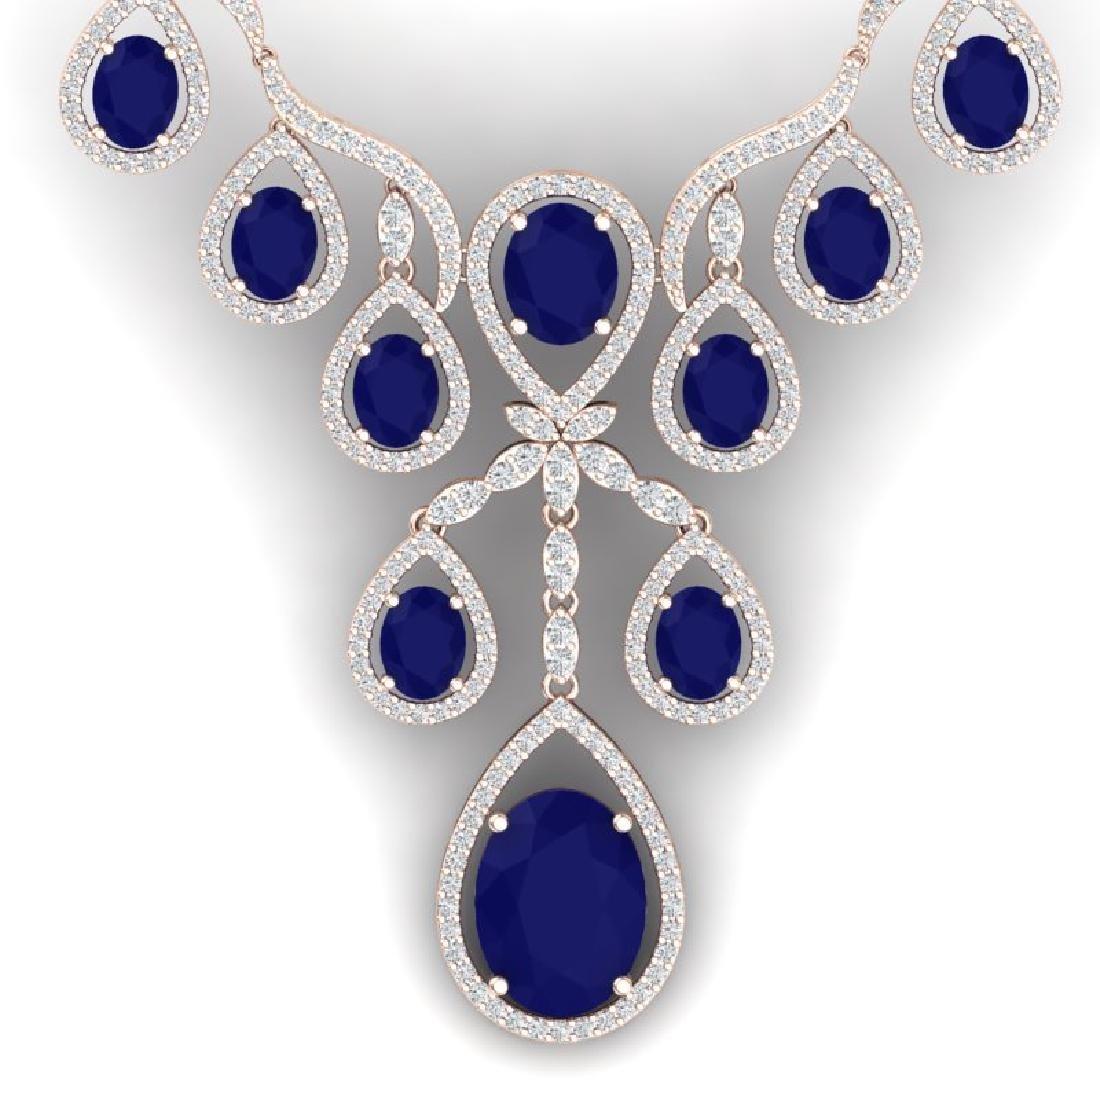 37.66 CTW Royalty Sapphire & VS Diamond Necklace 18K